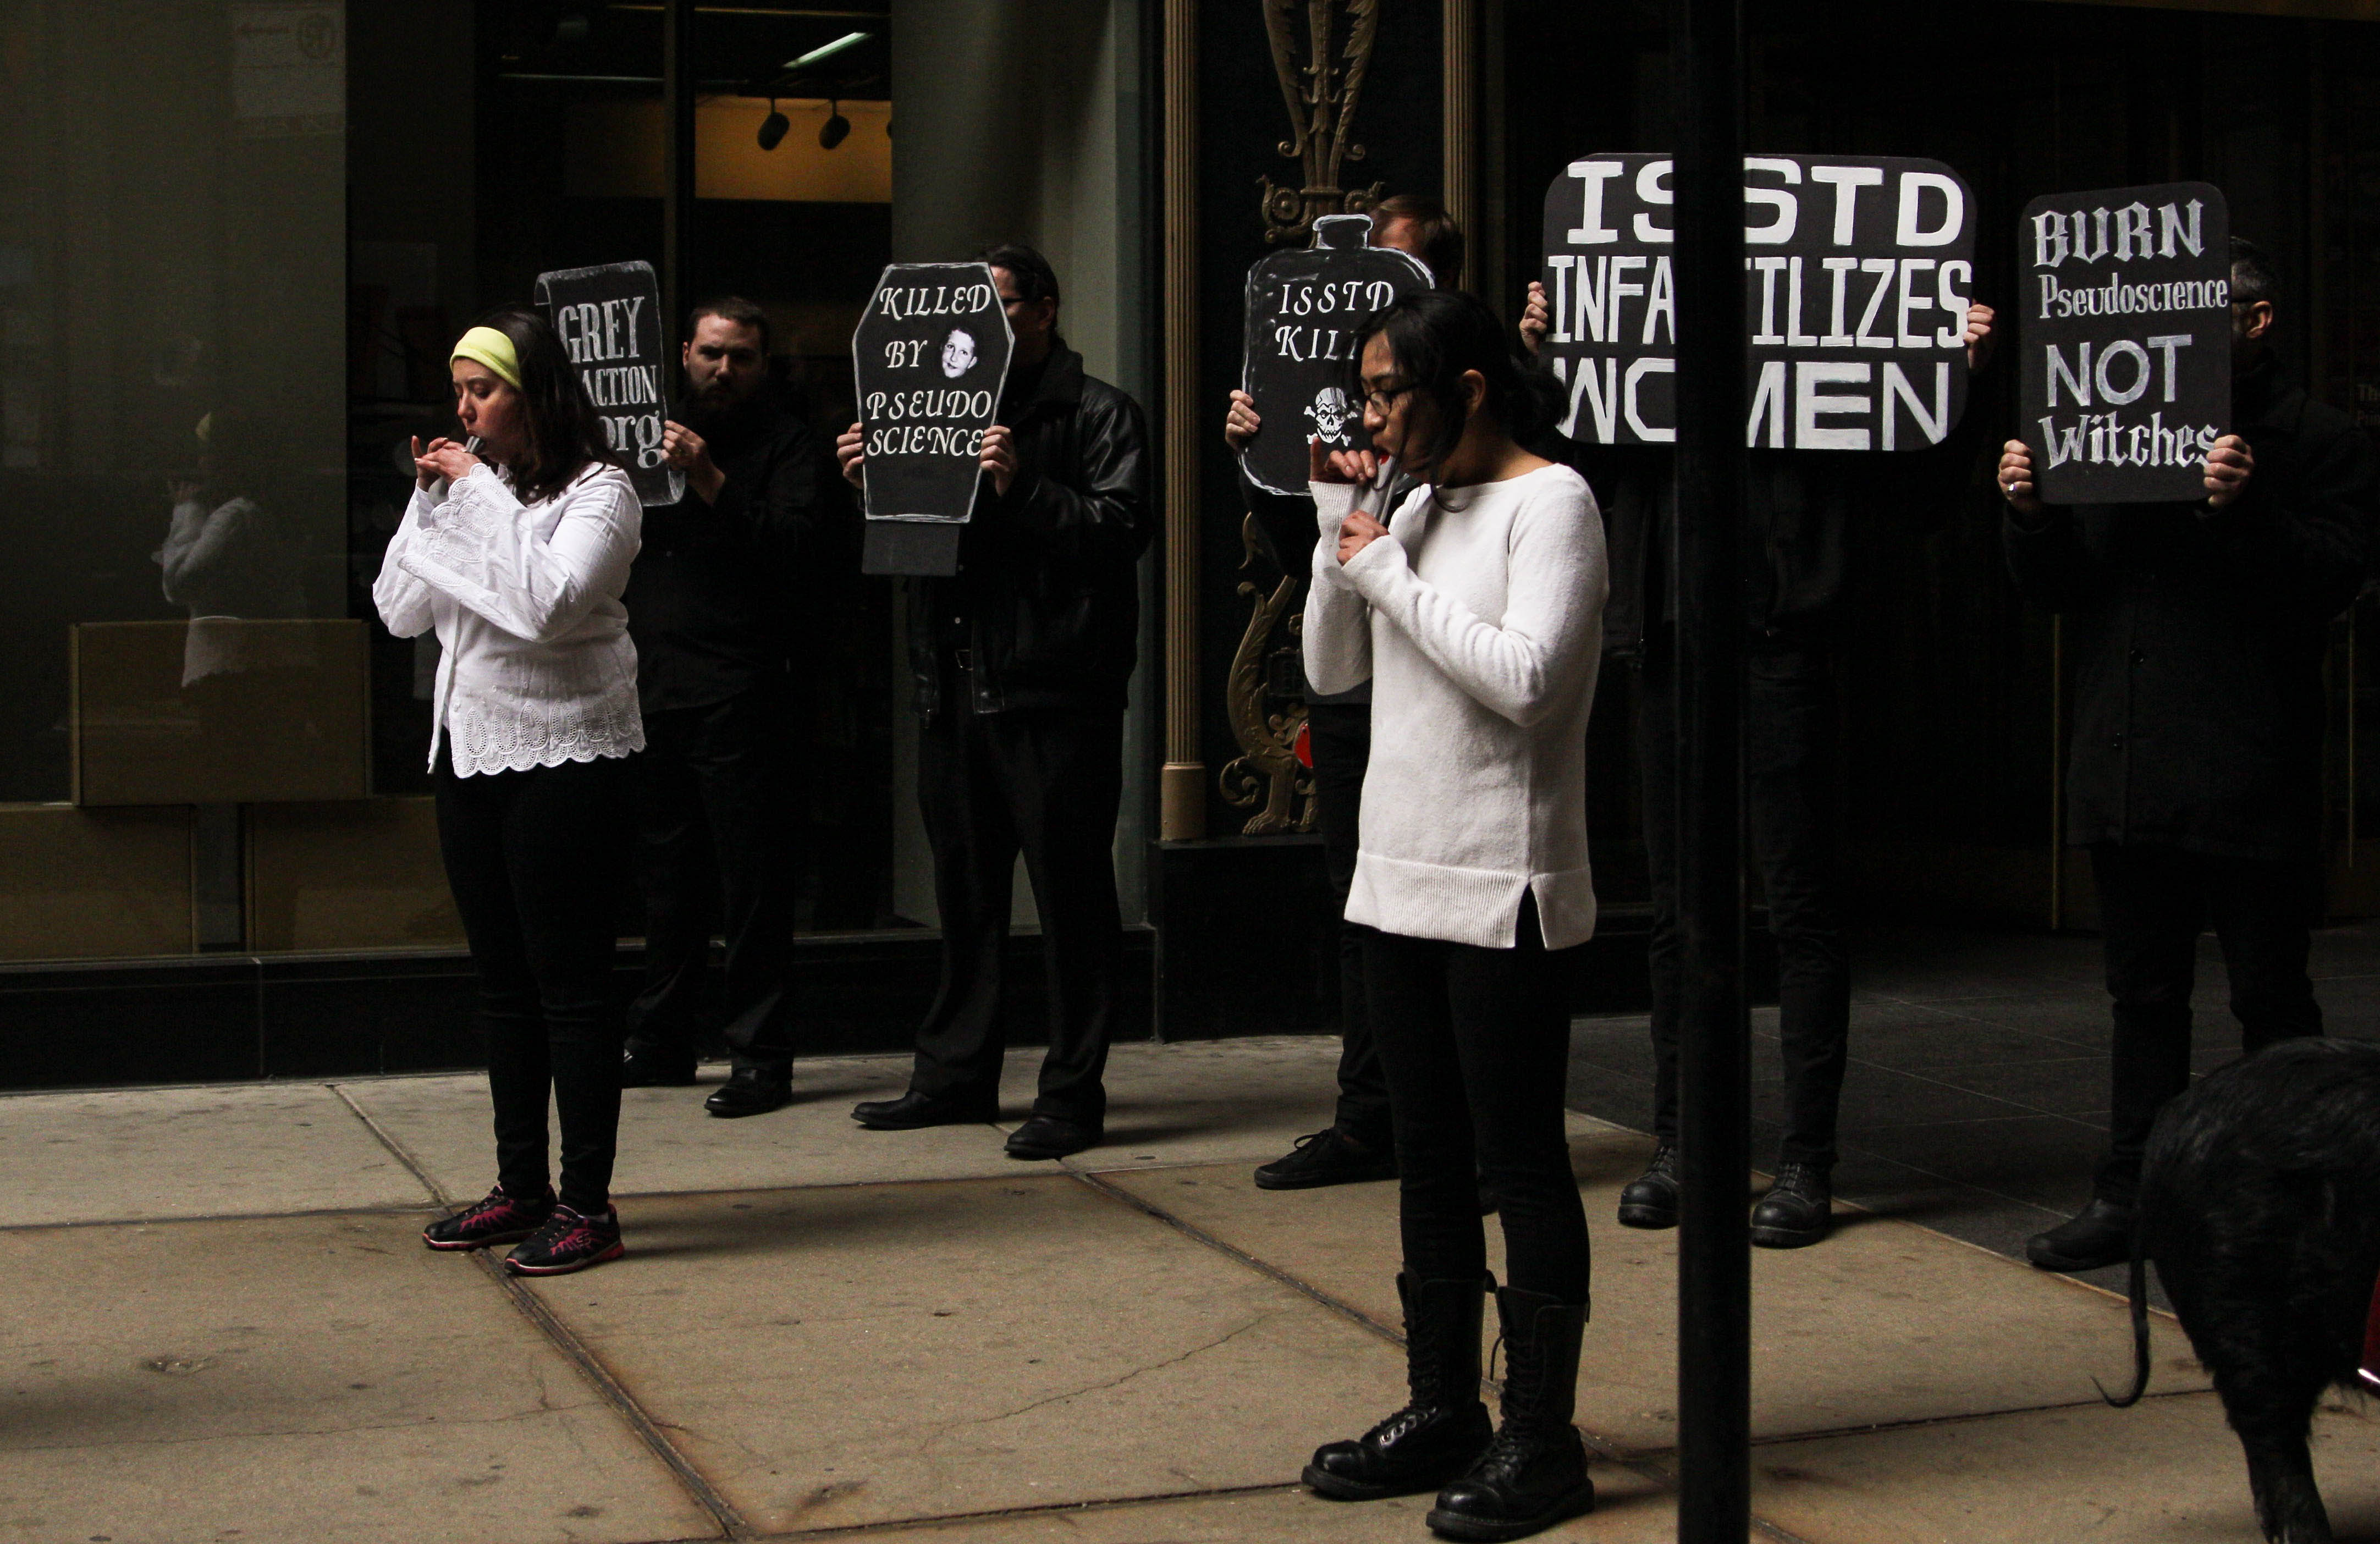 ISSTD Protest